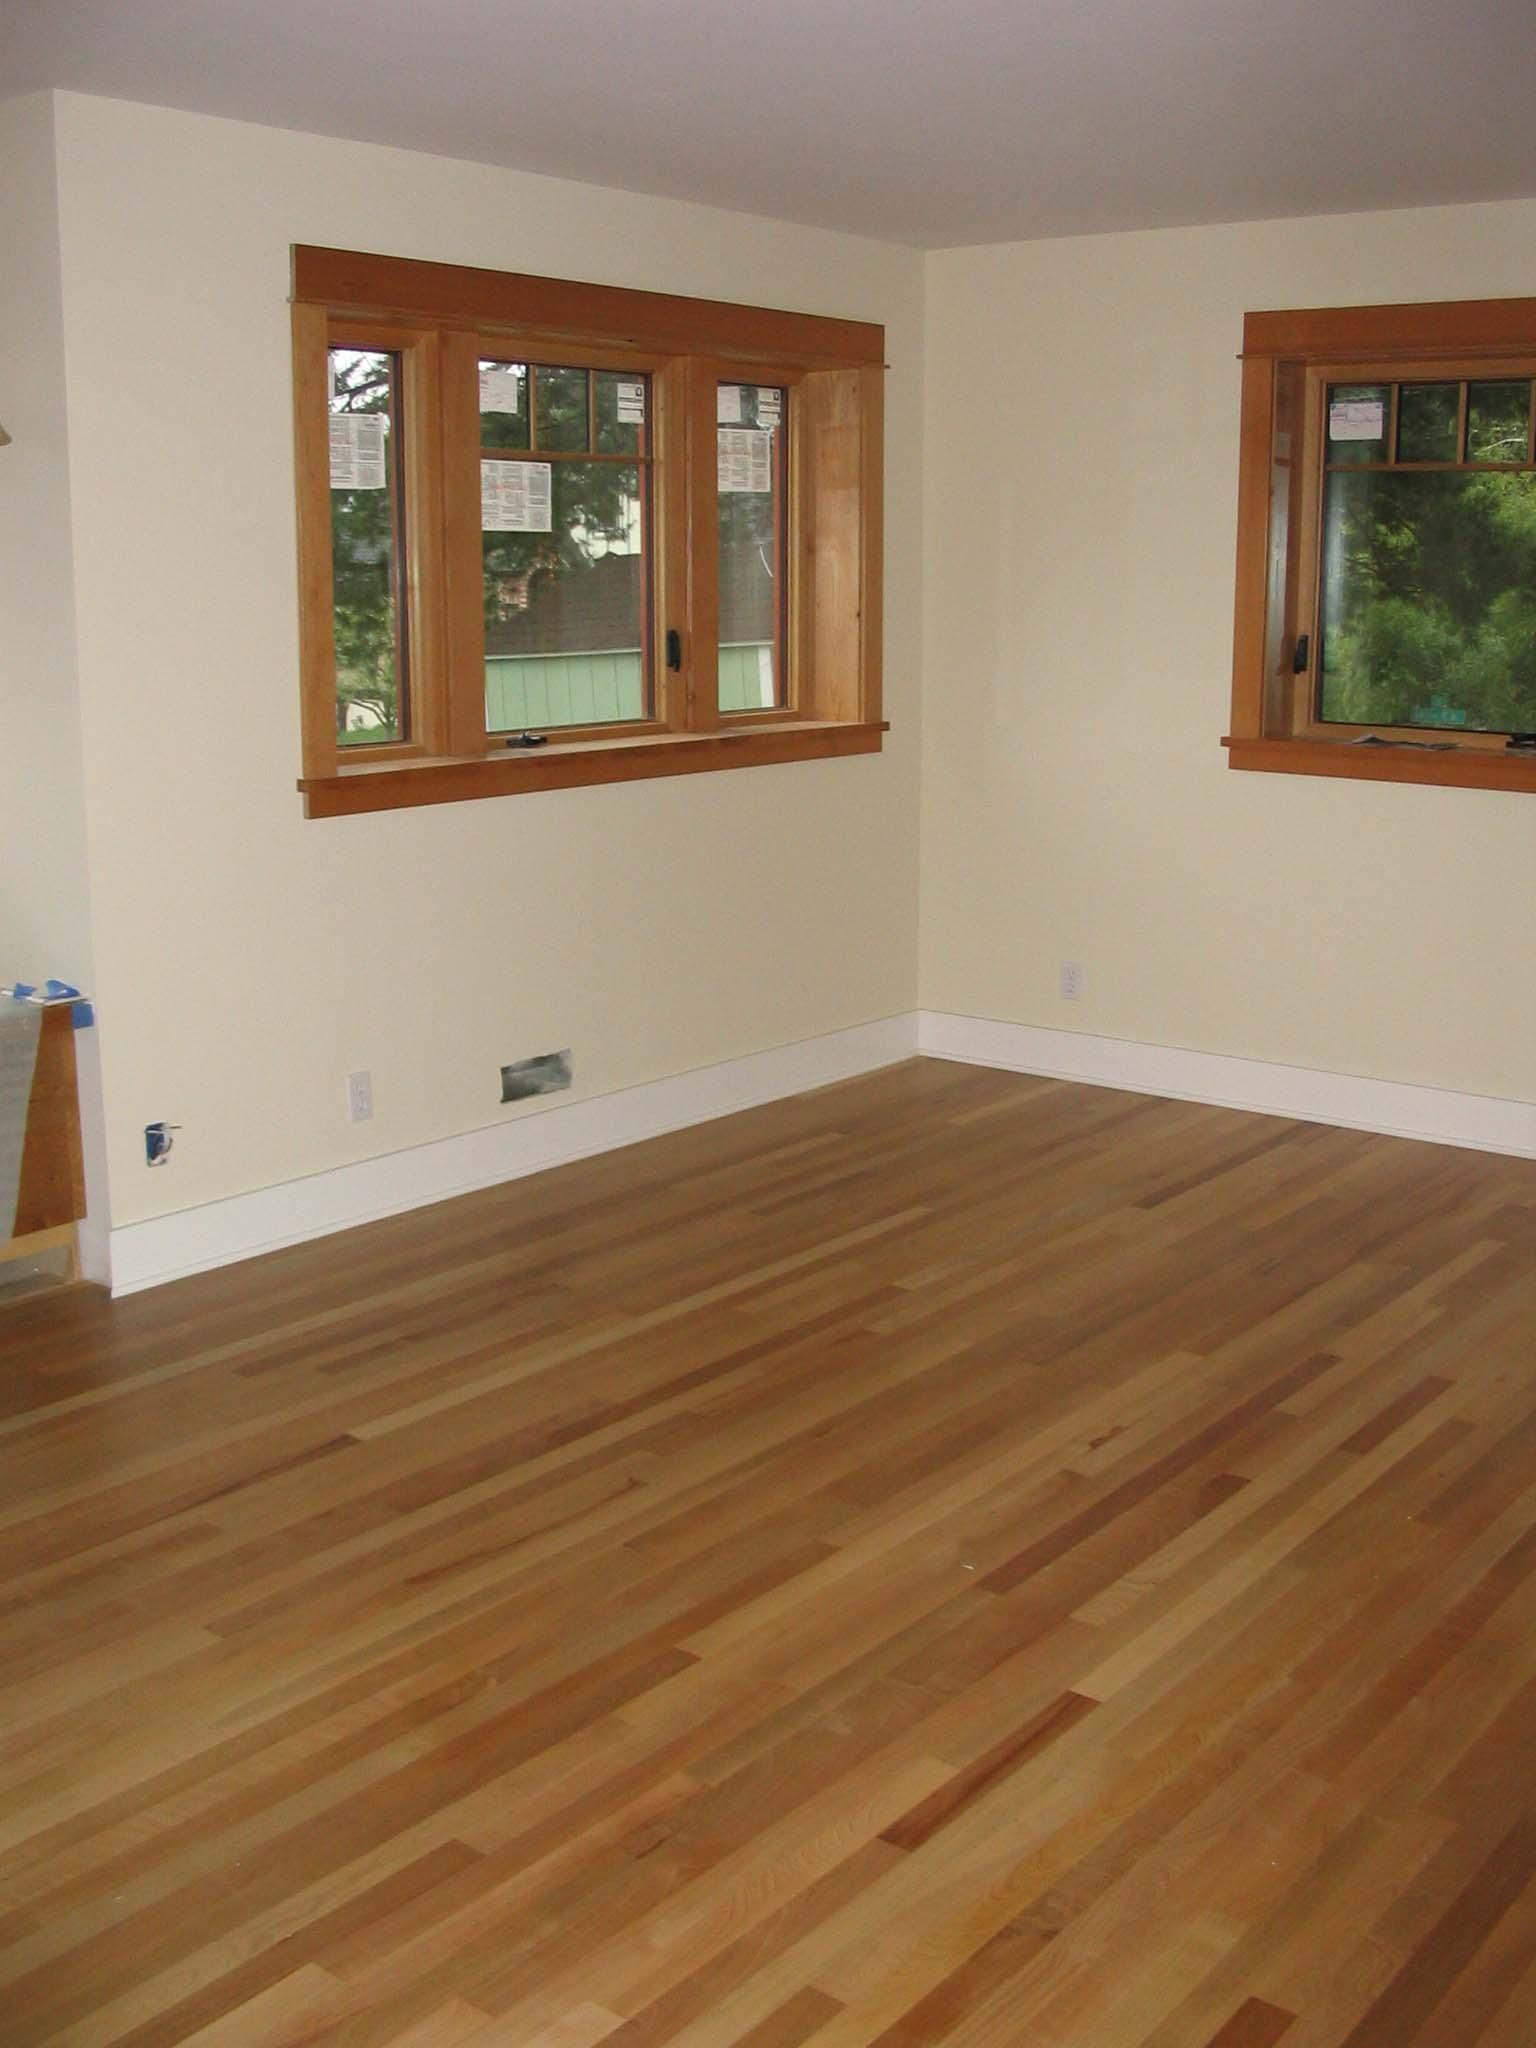 Living room floor & windows.jpg